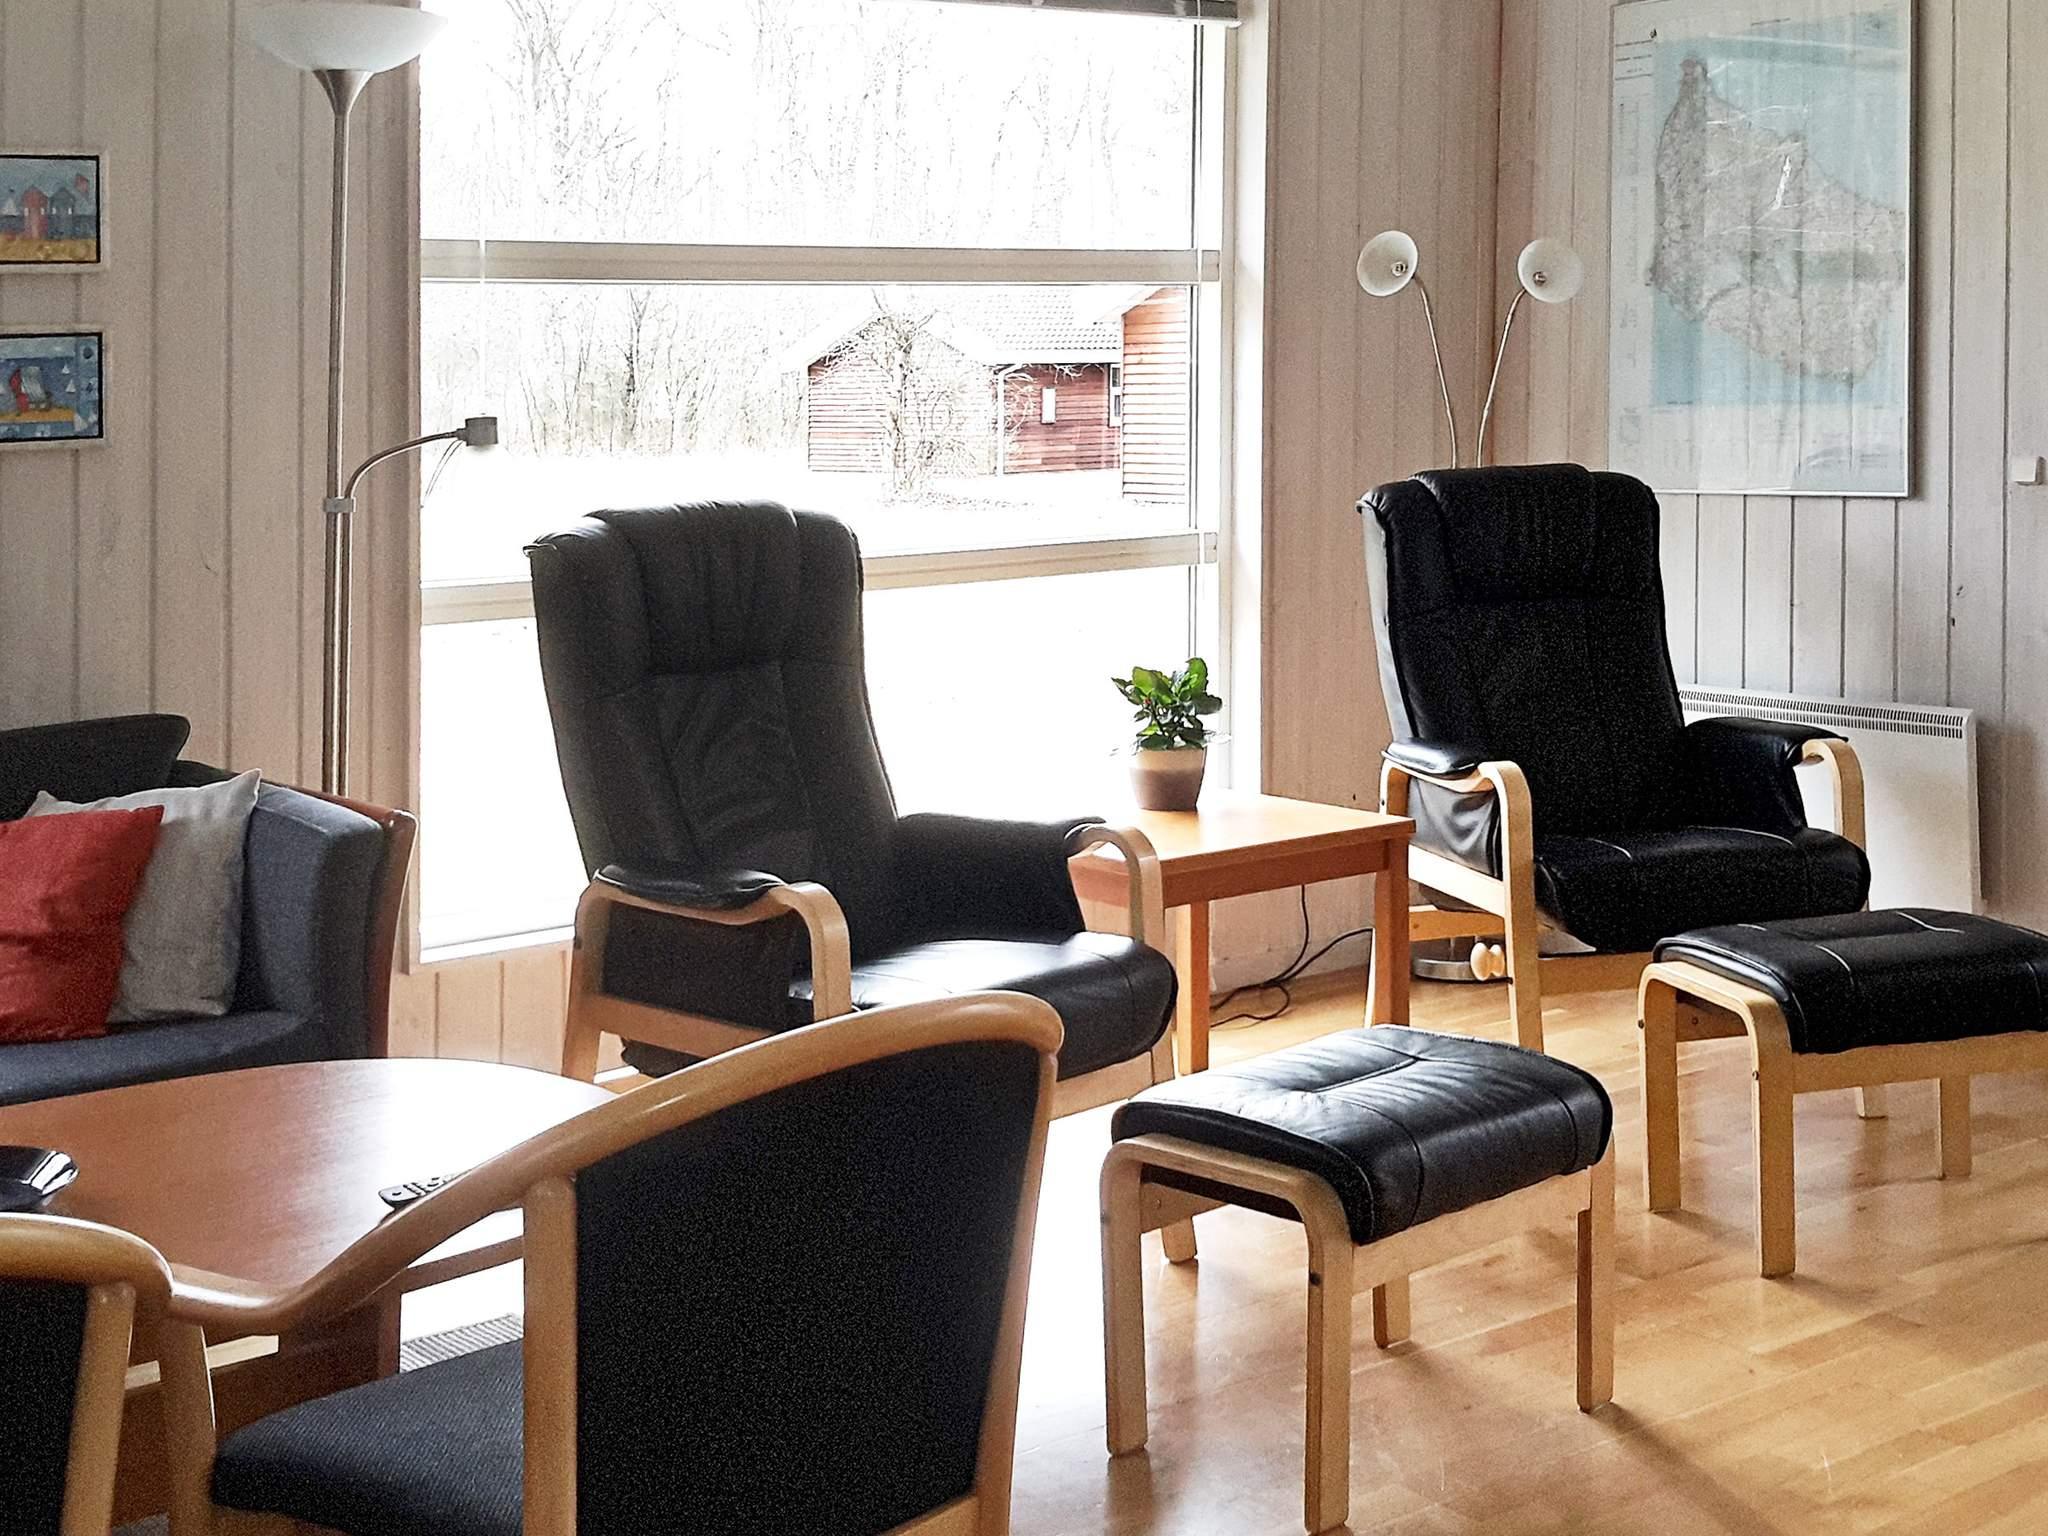 Ferienhaus Hasle (83274), Hasle, , Bornholm, Dänemark, Bild 12